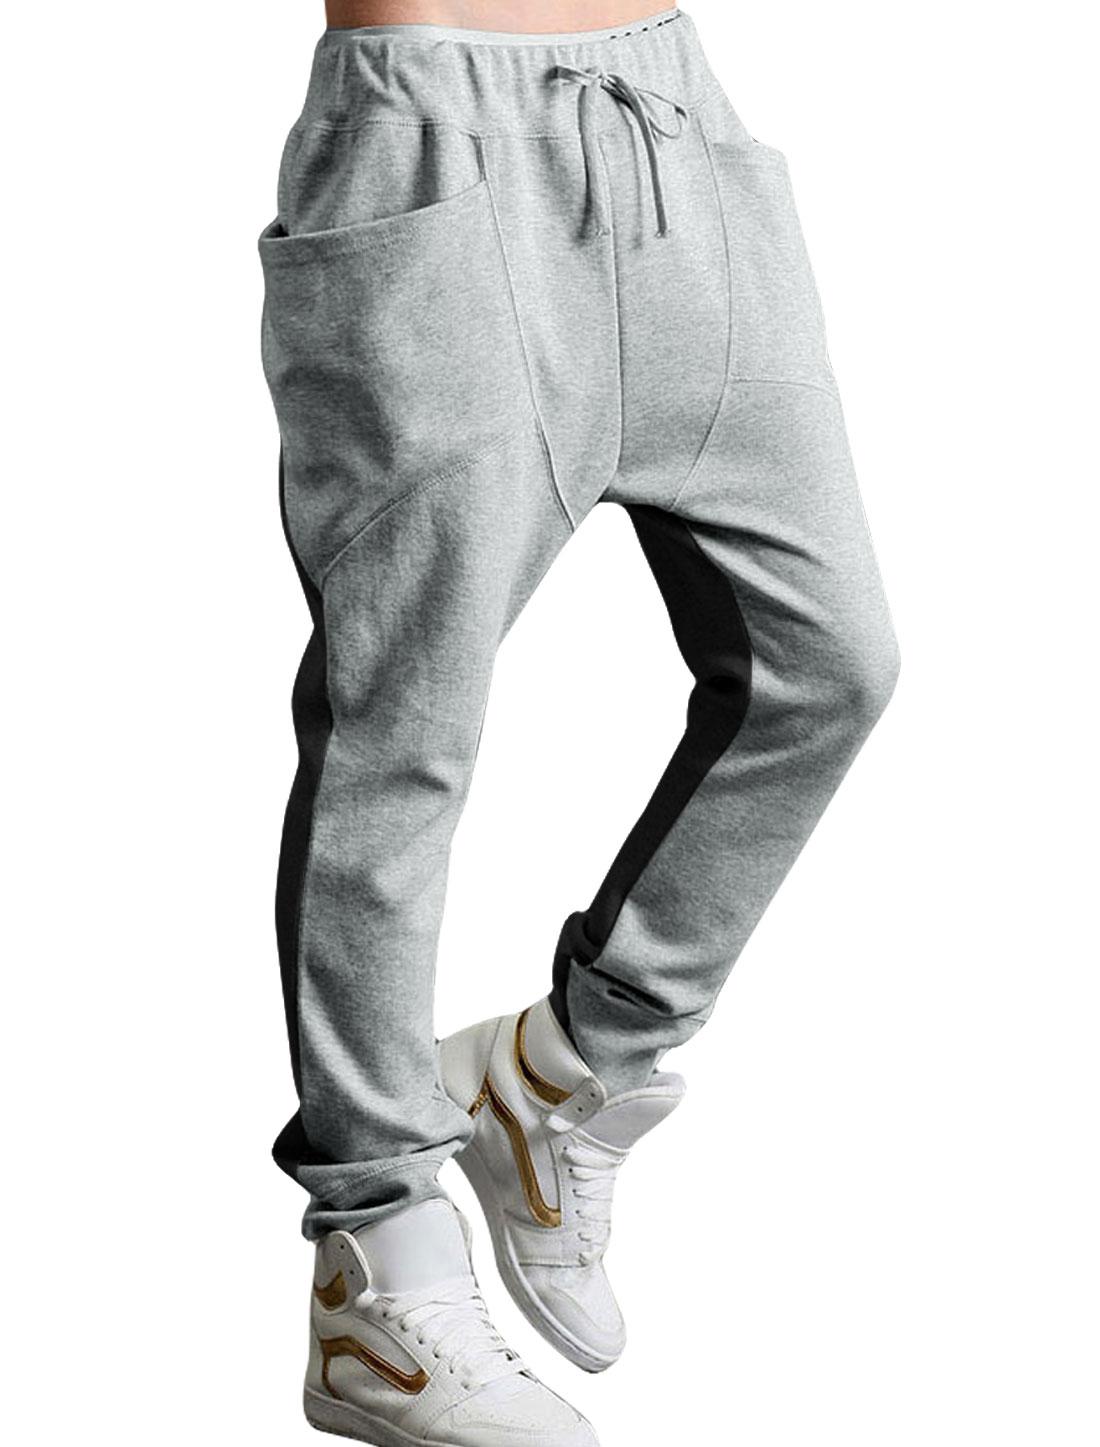 Men Drop Crotch Funnel Pockets Drawstring Sweatpants Gray Black W28/30